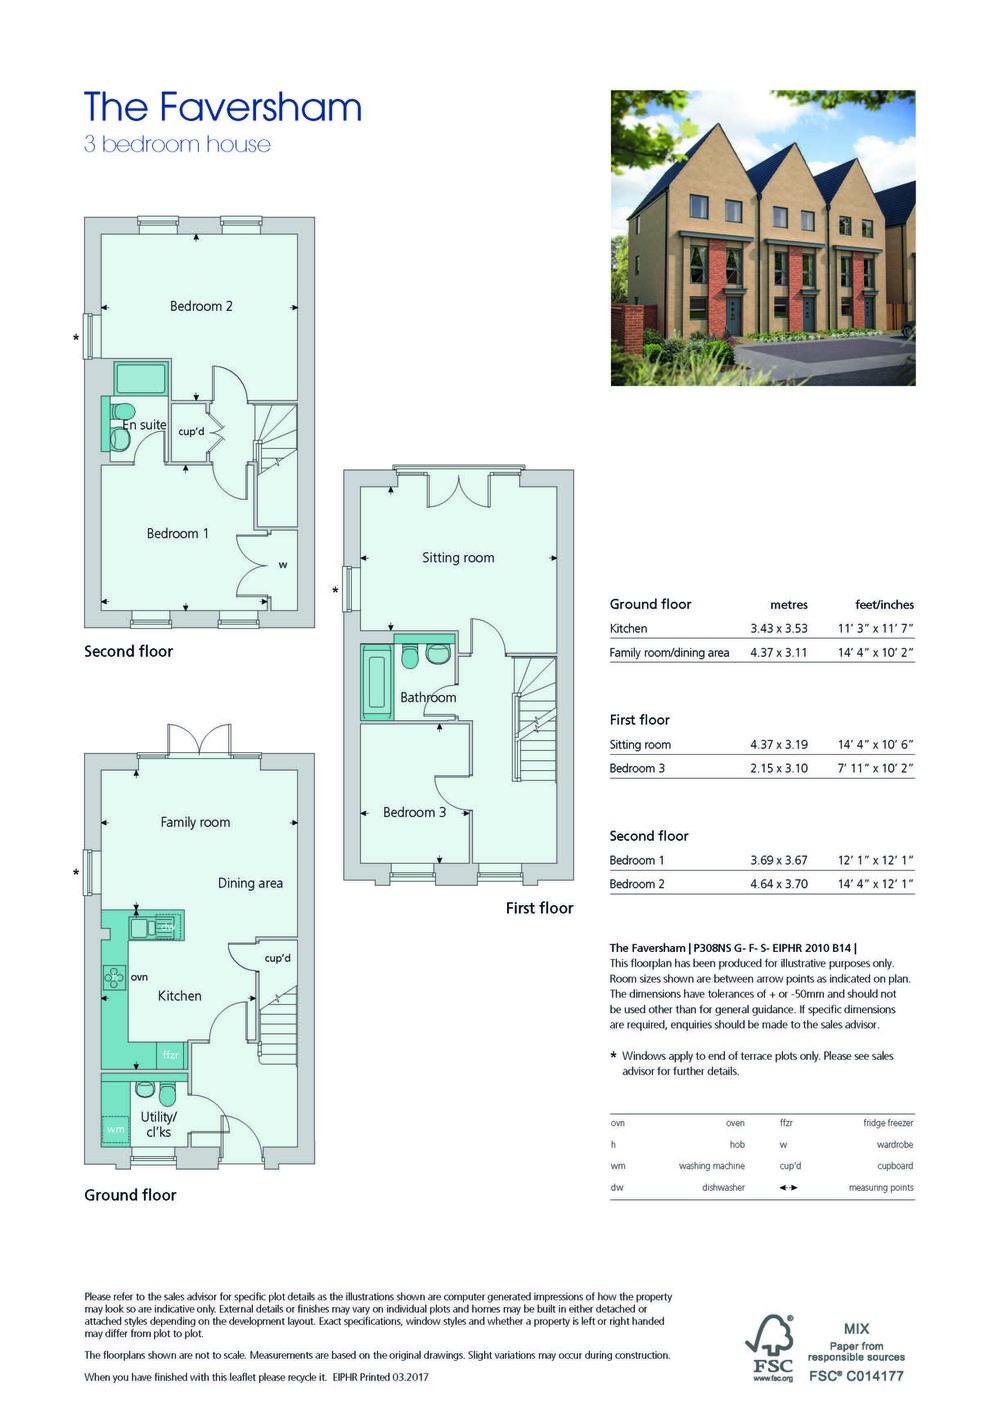 Faversham Floor Plan.jpg